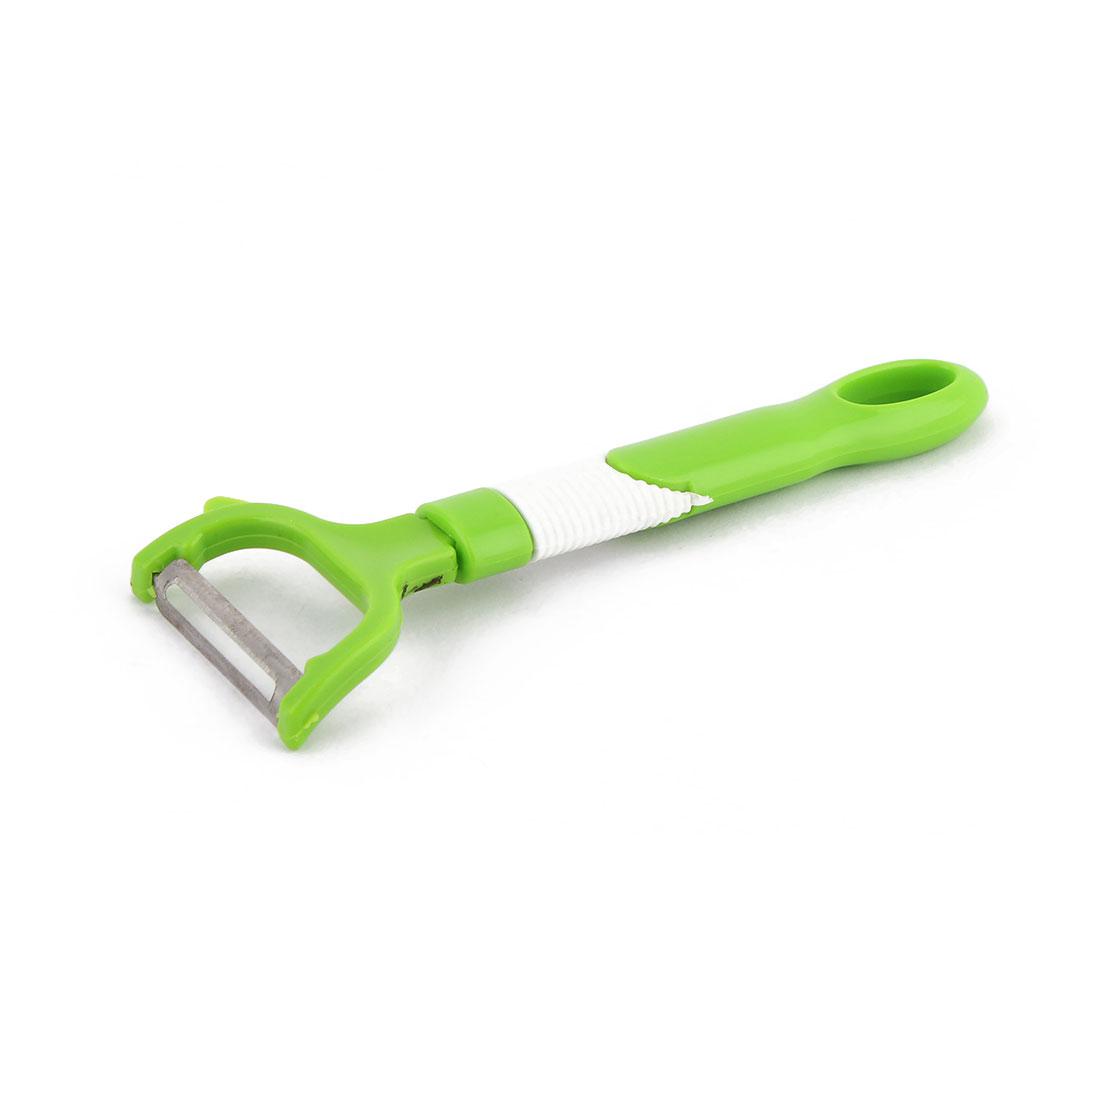 Kitchenware Plastic Fruit Vegetable Peeler Potato Cucumber Cutter Green White